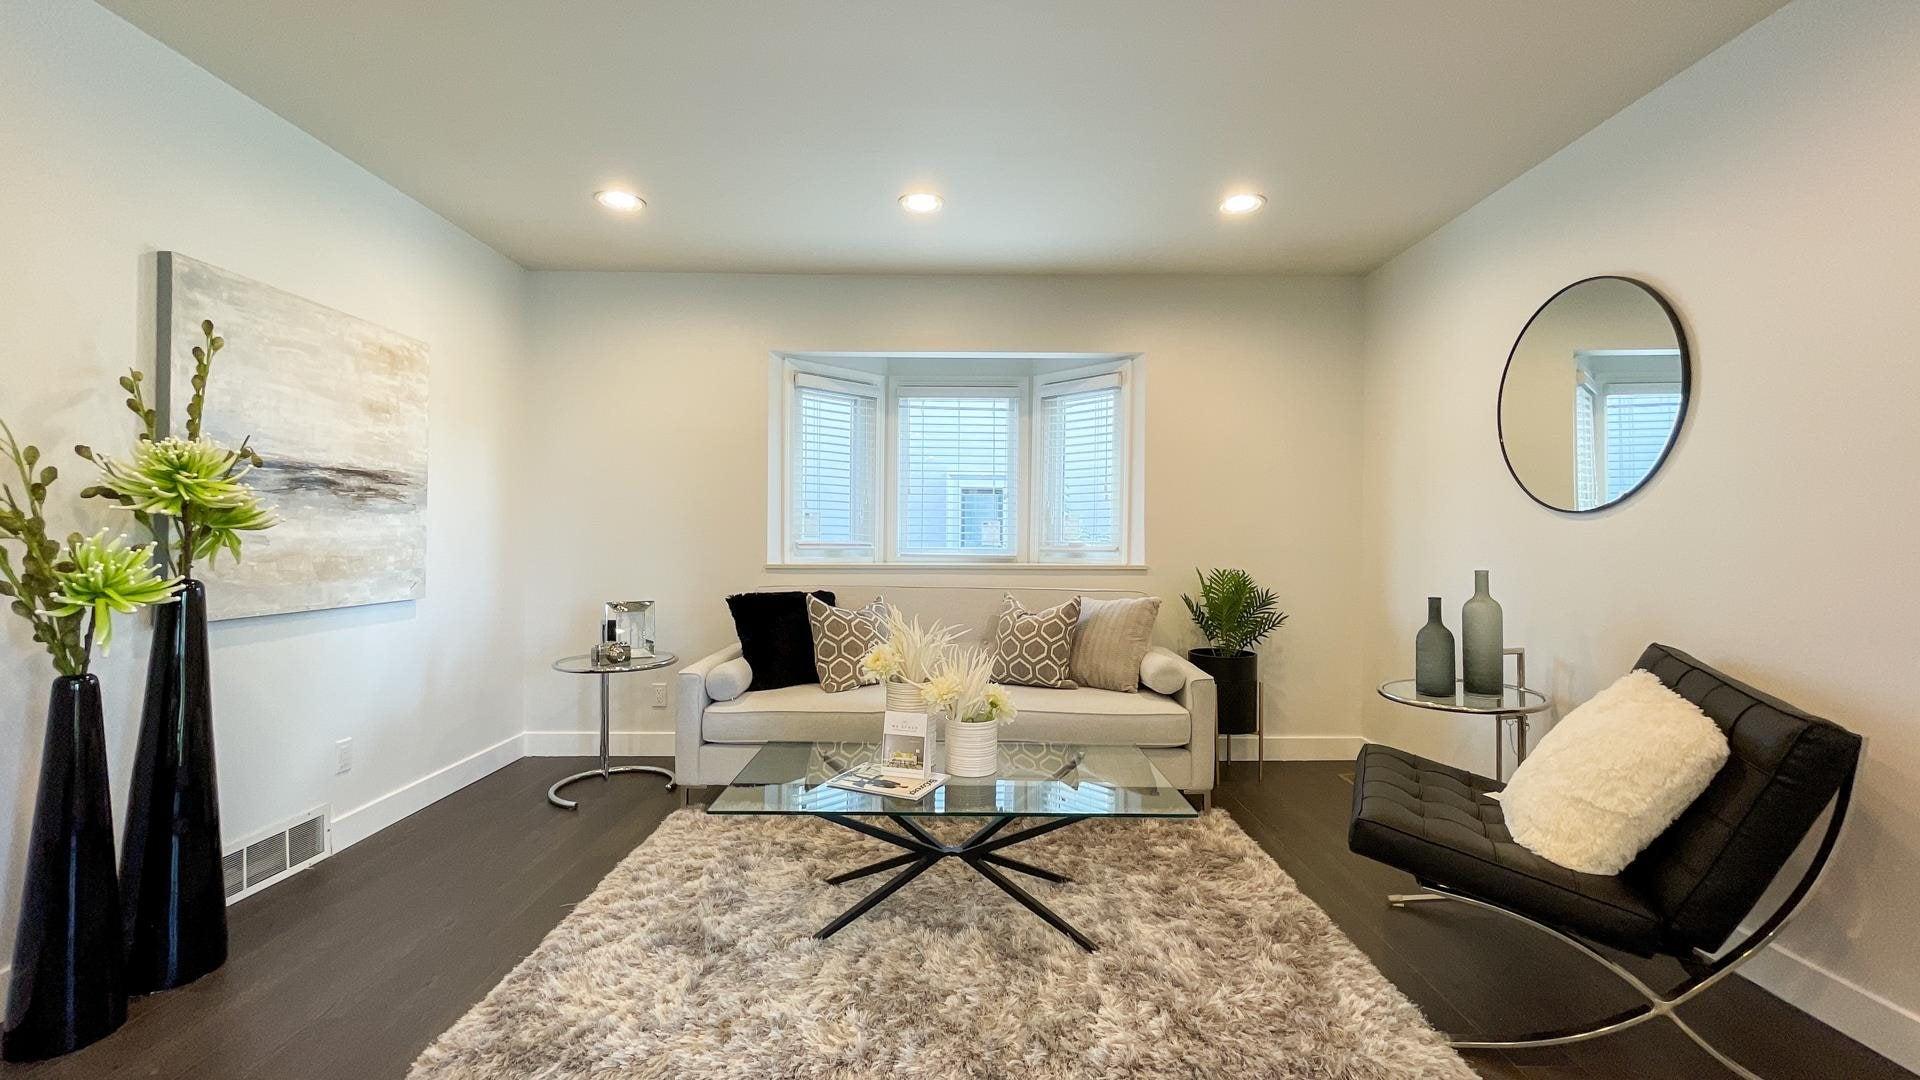 1168 JEFFERSON AVENUE - Ambleside House/Single Family for sale, 6 Bedrooms (R2602275) - #8